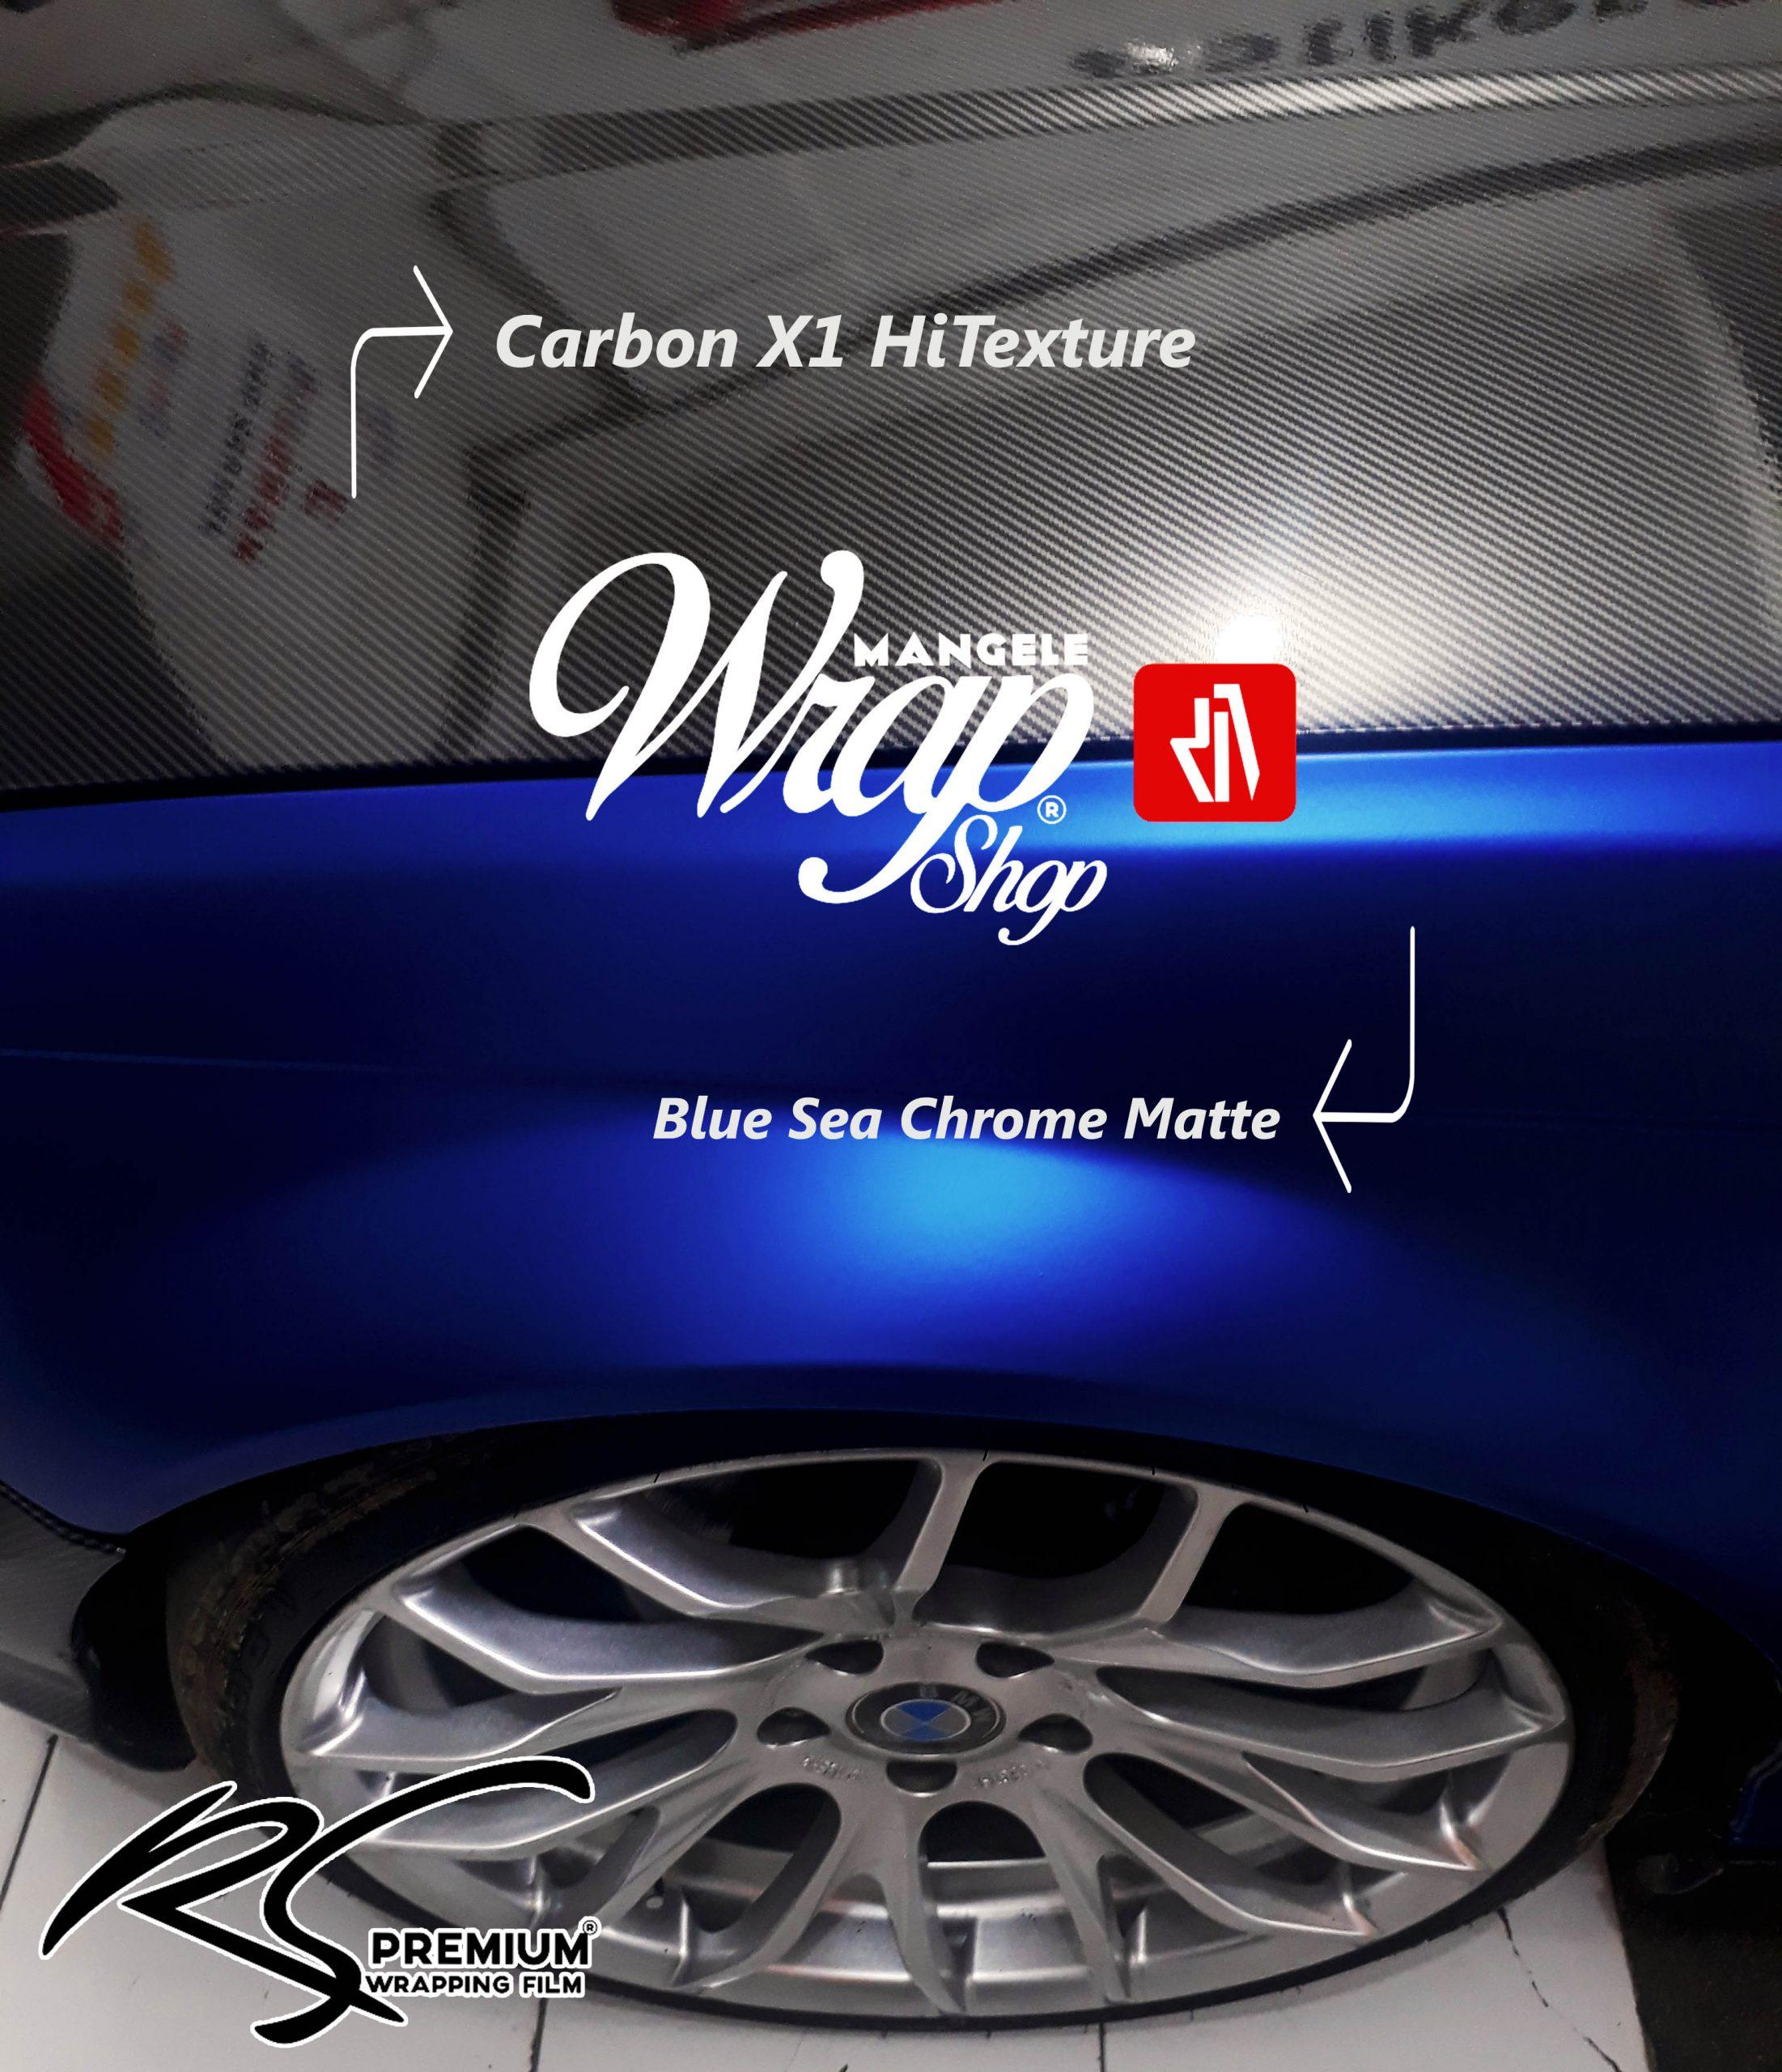 Stiker Pelindung Kap Mesin Mobil Carbon X1 HiTexture Premium